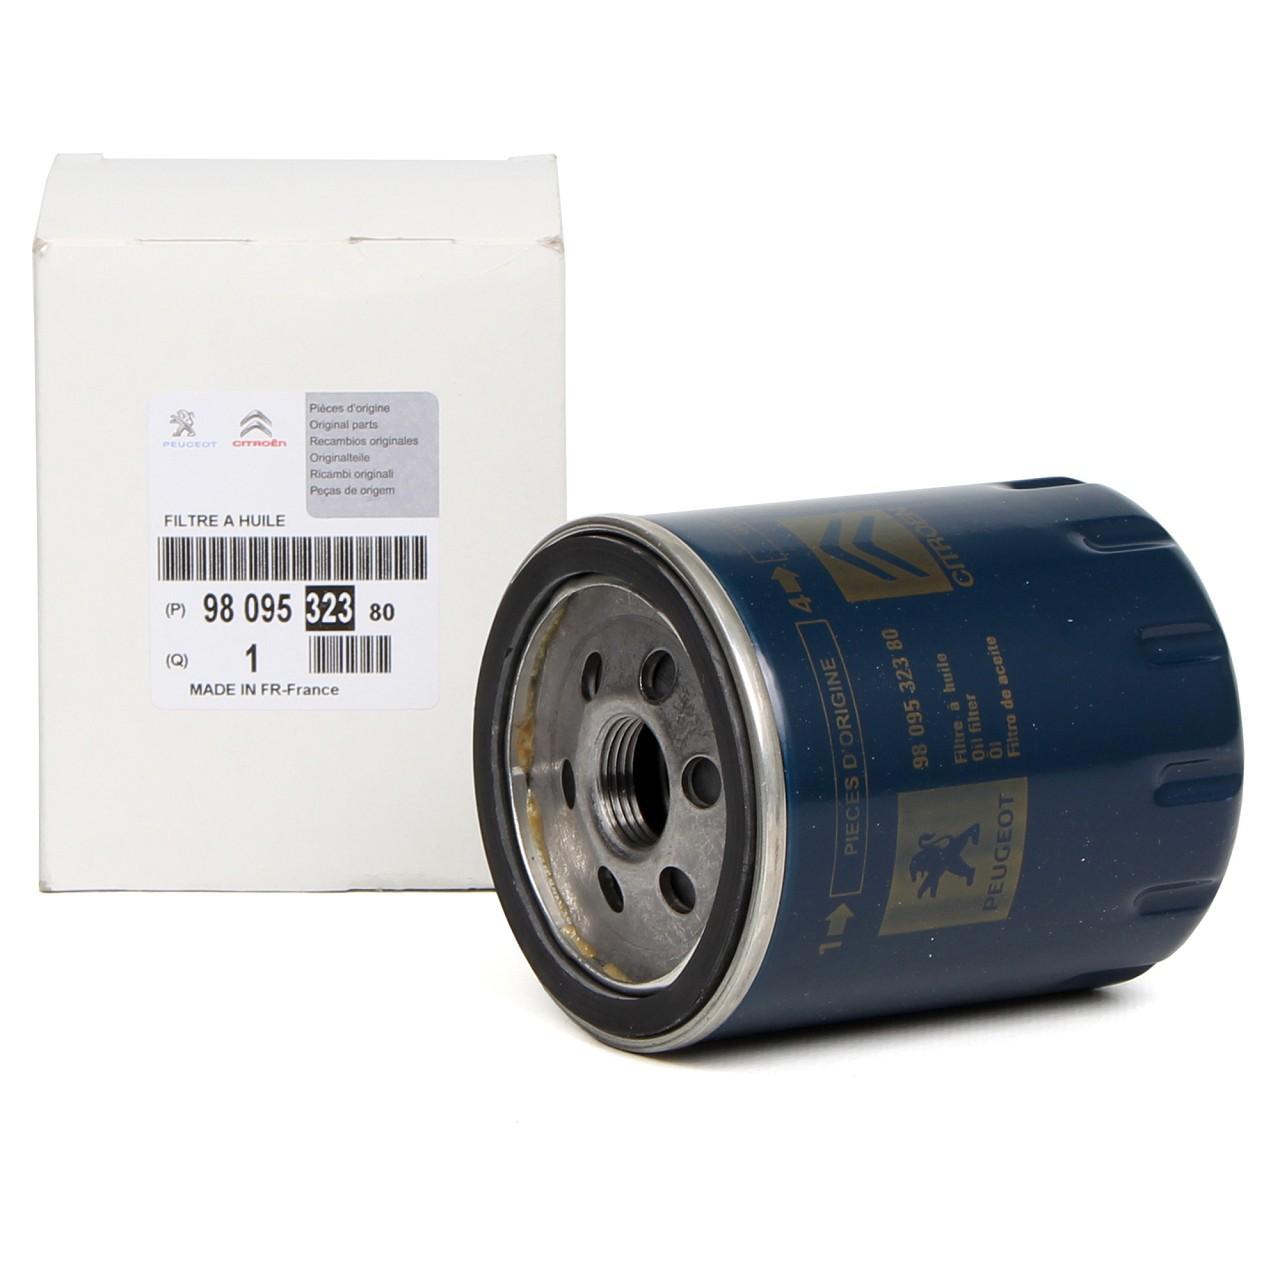 ORIGINAL Citroen Peugeot Ölfilter JUMPER BOXER 2.0 BlueHDi 9809532380